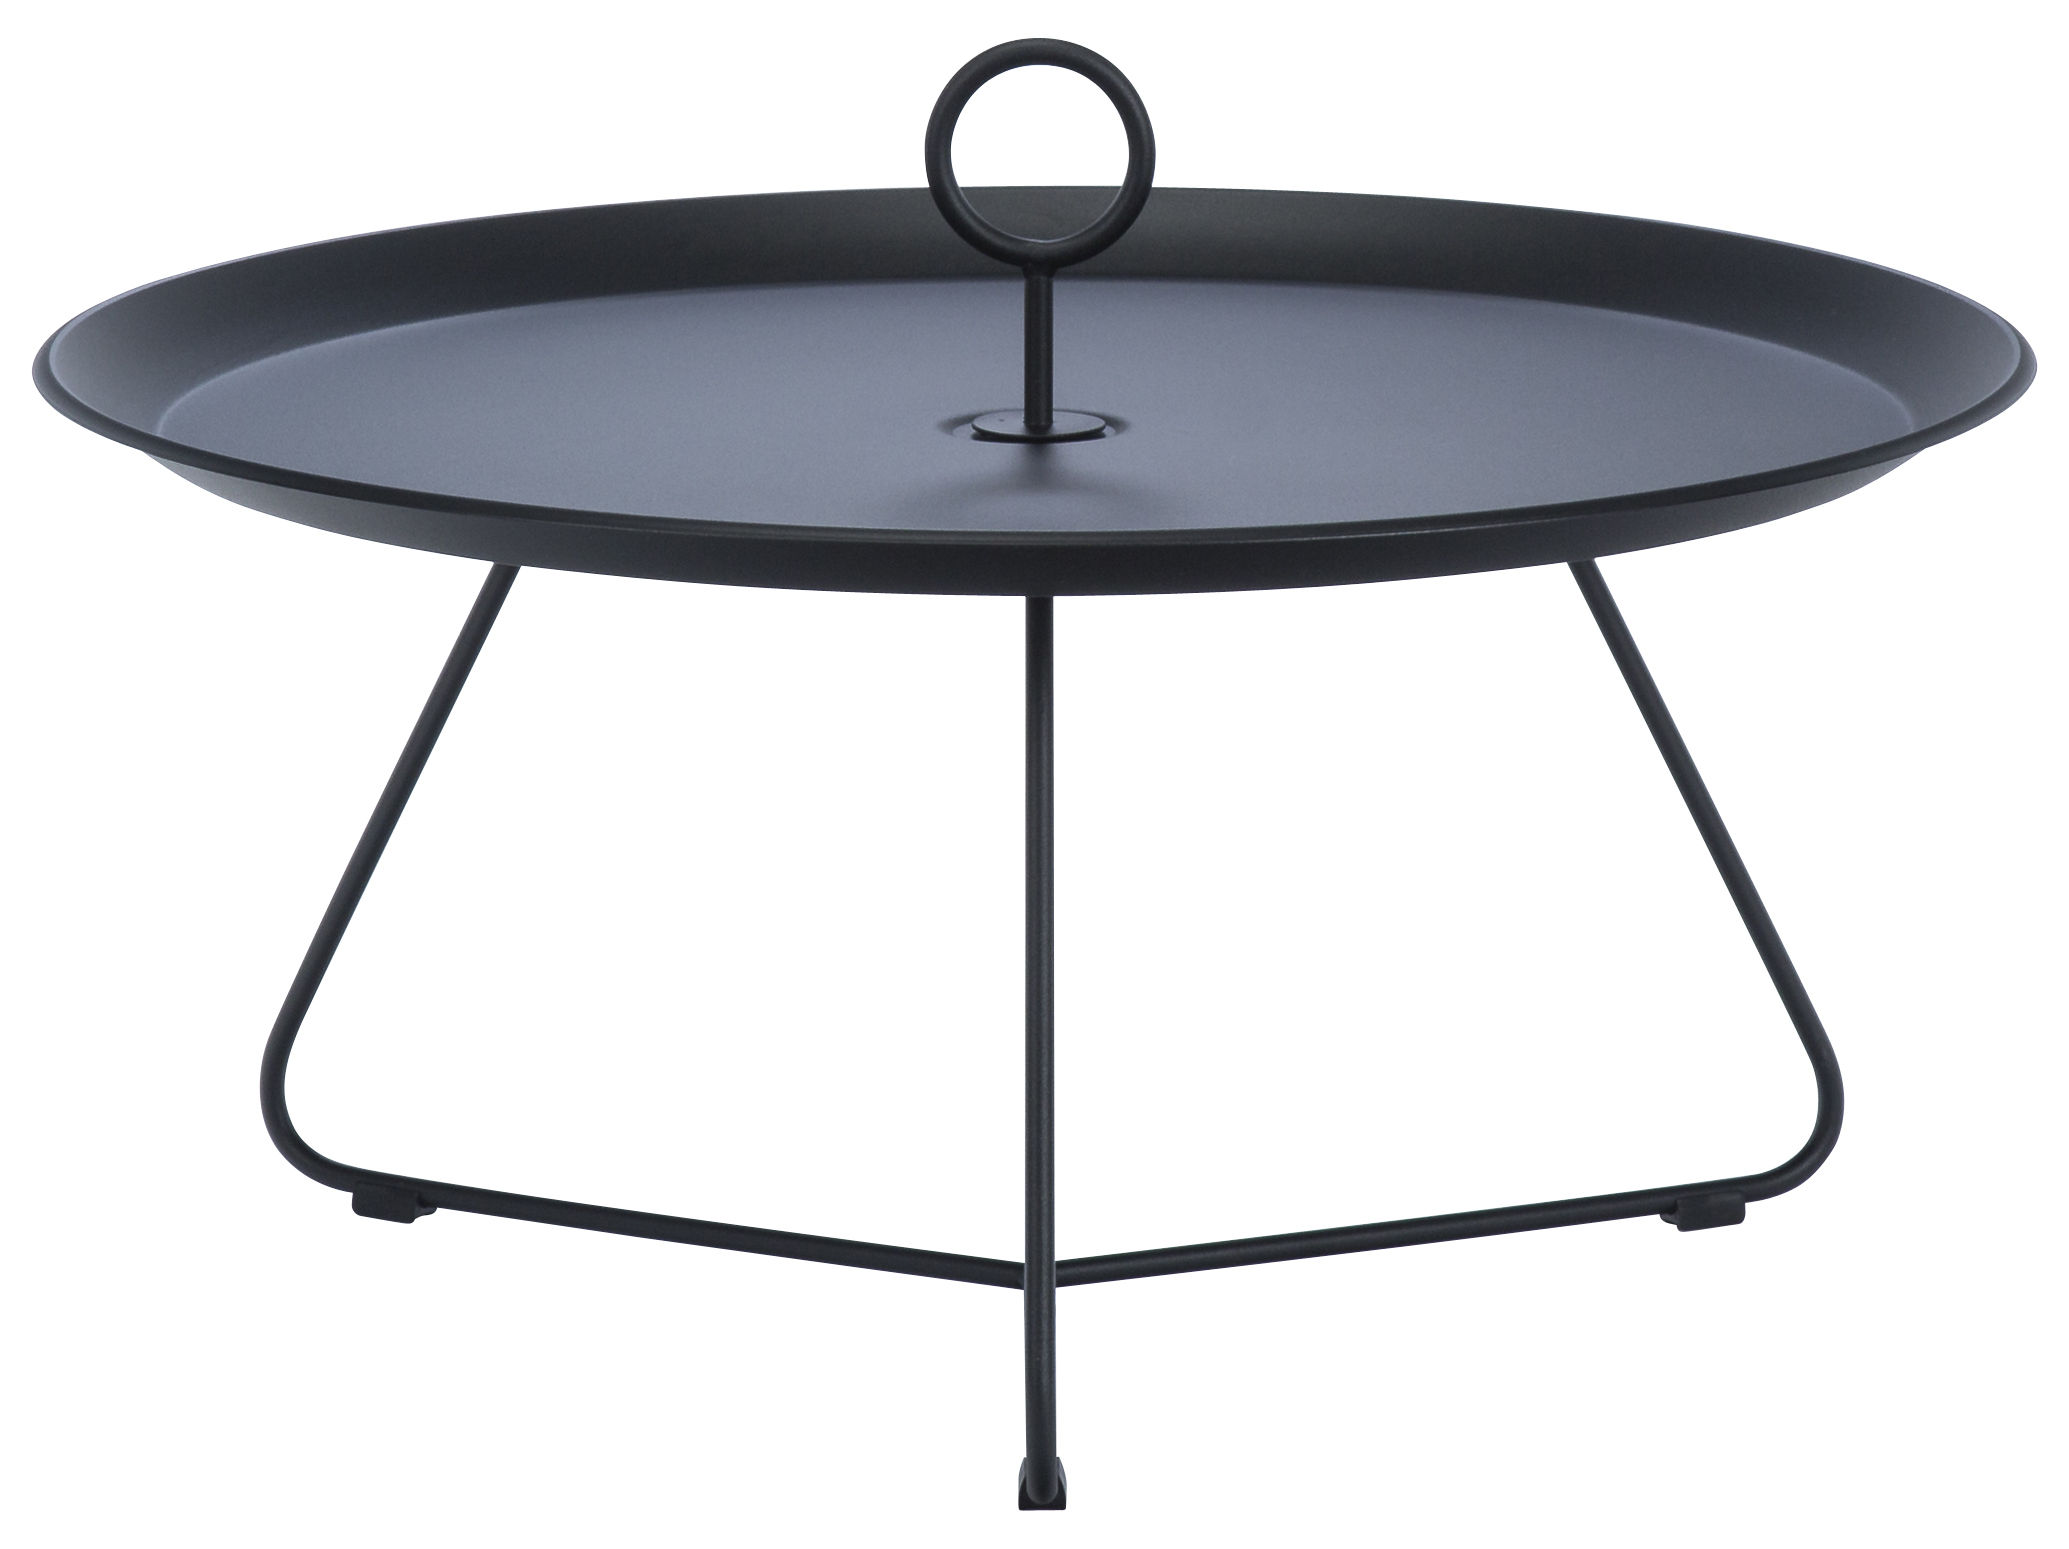 Table basse eyelet large 80 x h 35 cm noir houe for Table basse panier